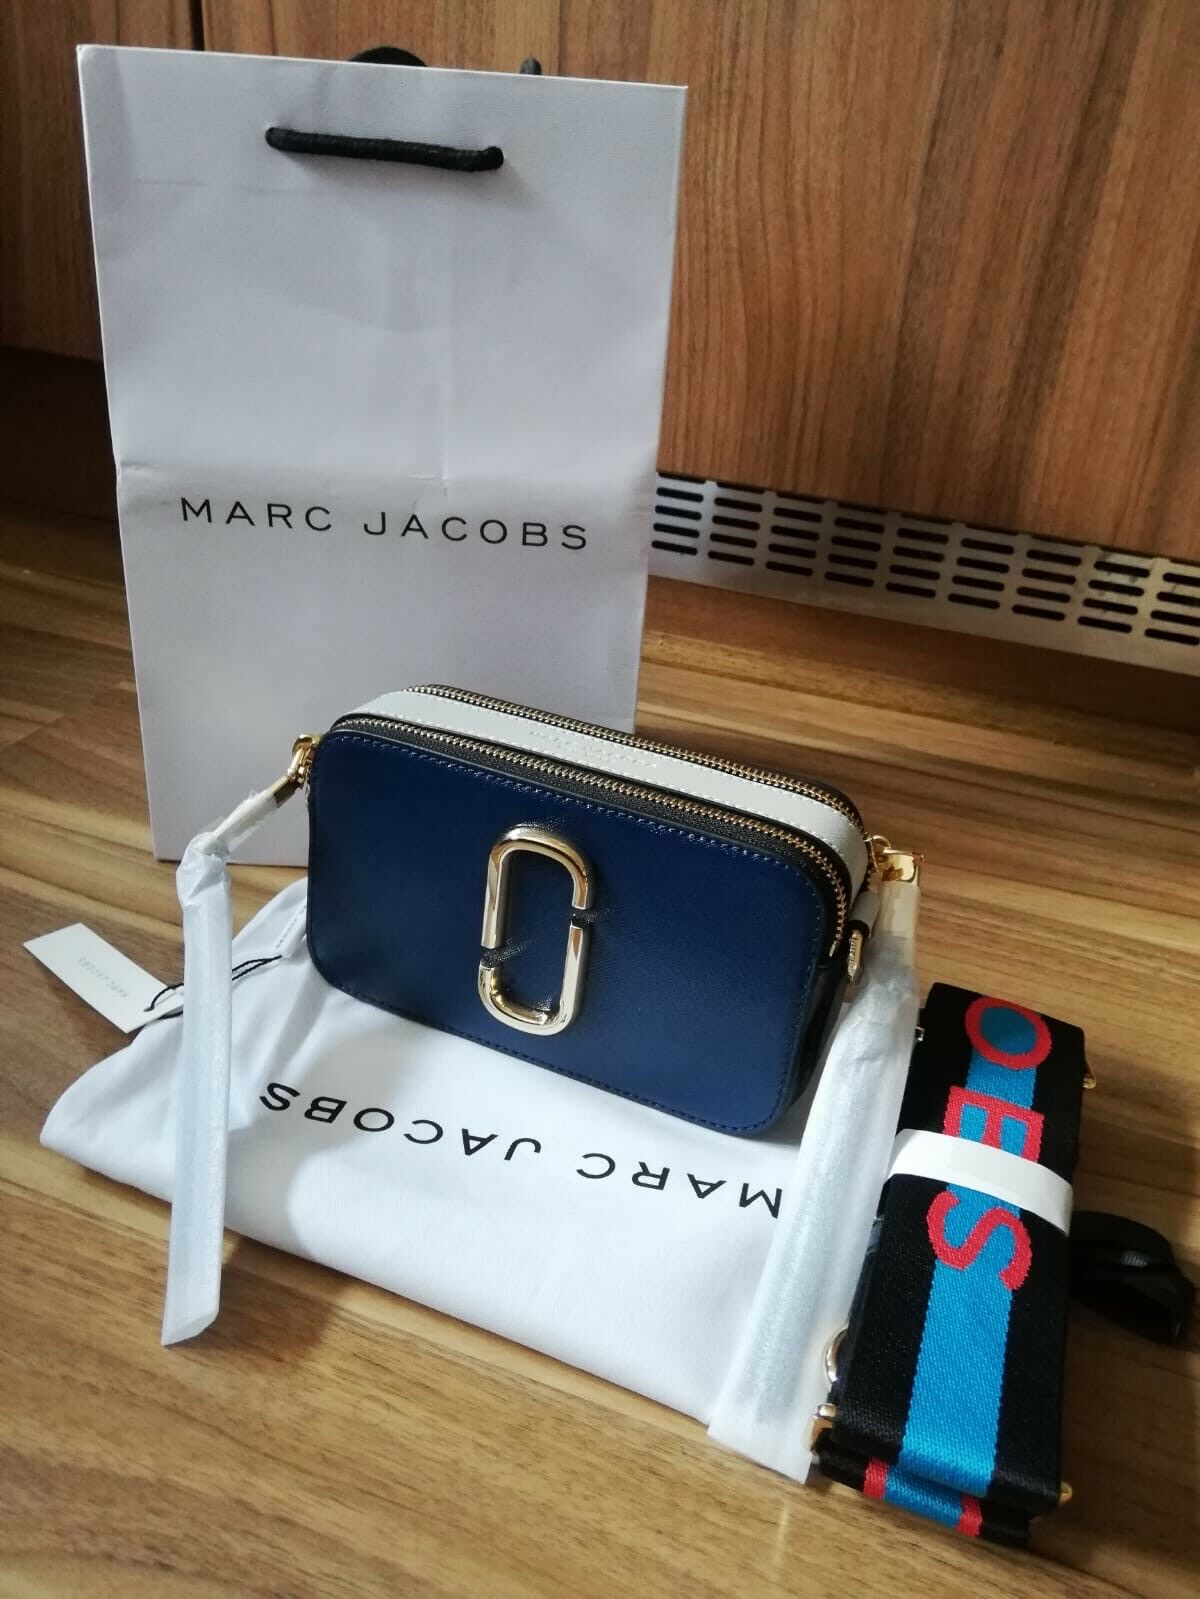 e7a6c5804c76 BNWT Marc Jacobs Logo Strap Snapshot Small Camera Blue Sea Multi Cross Body  Bag